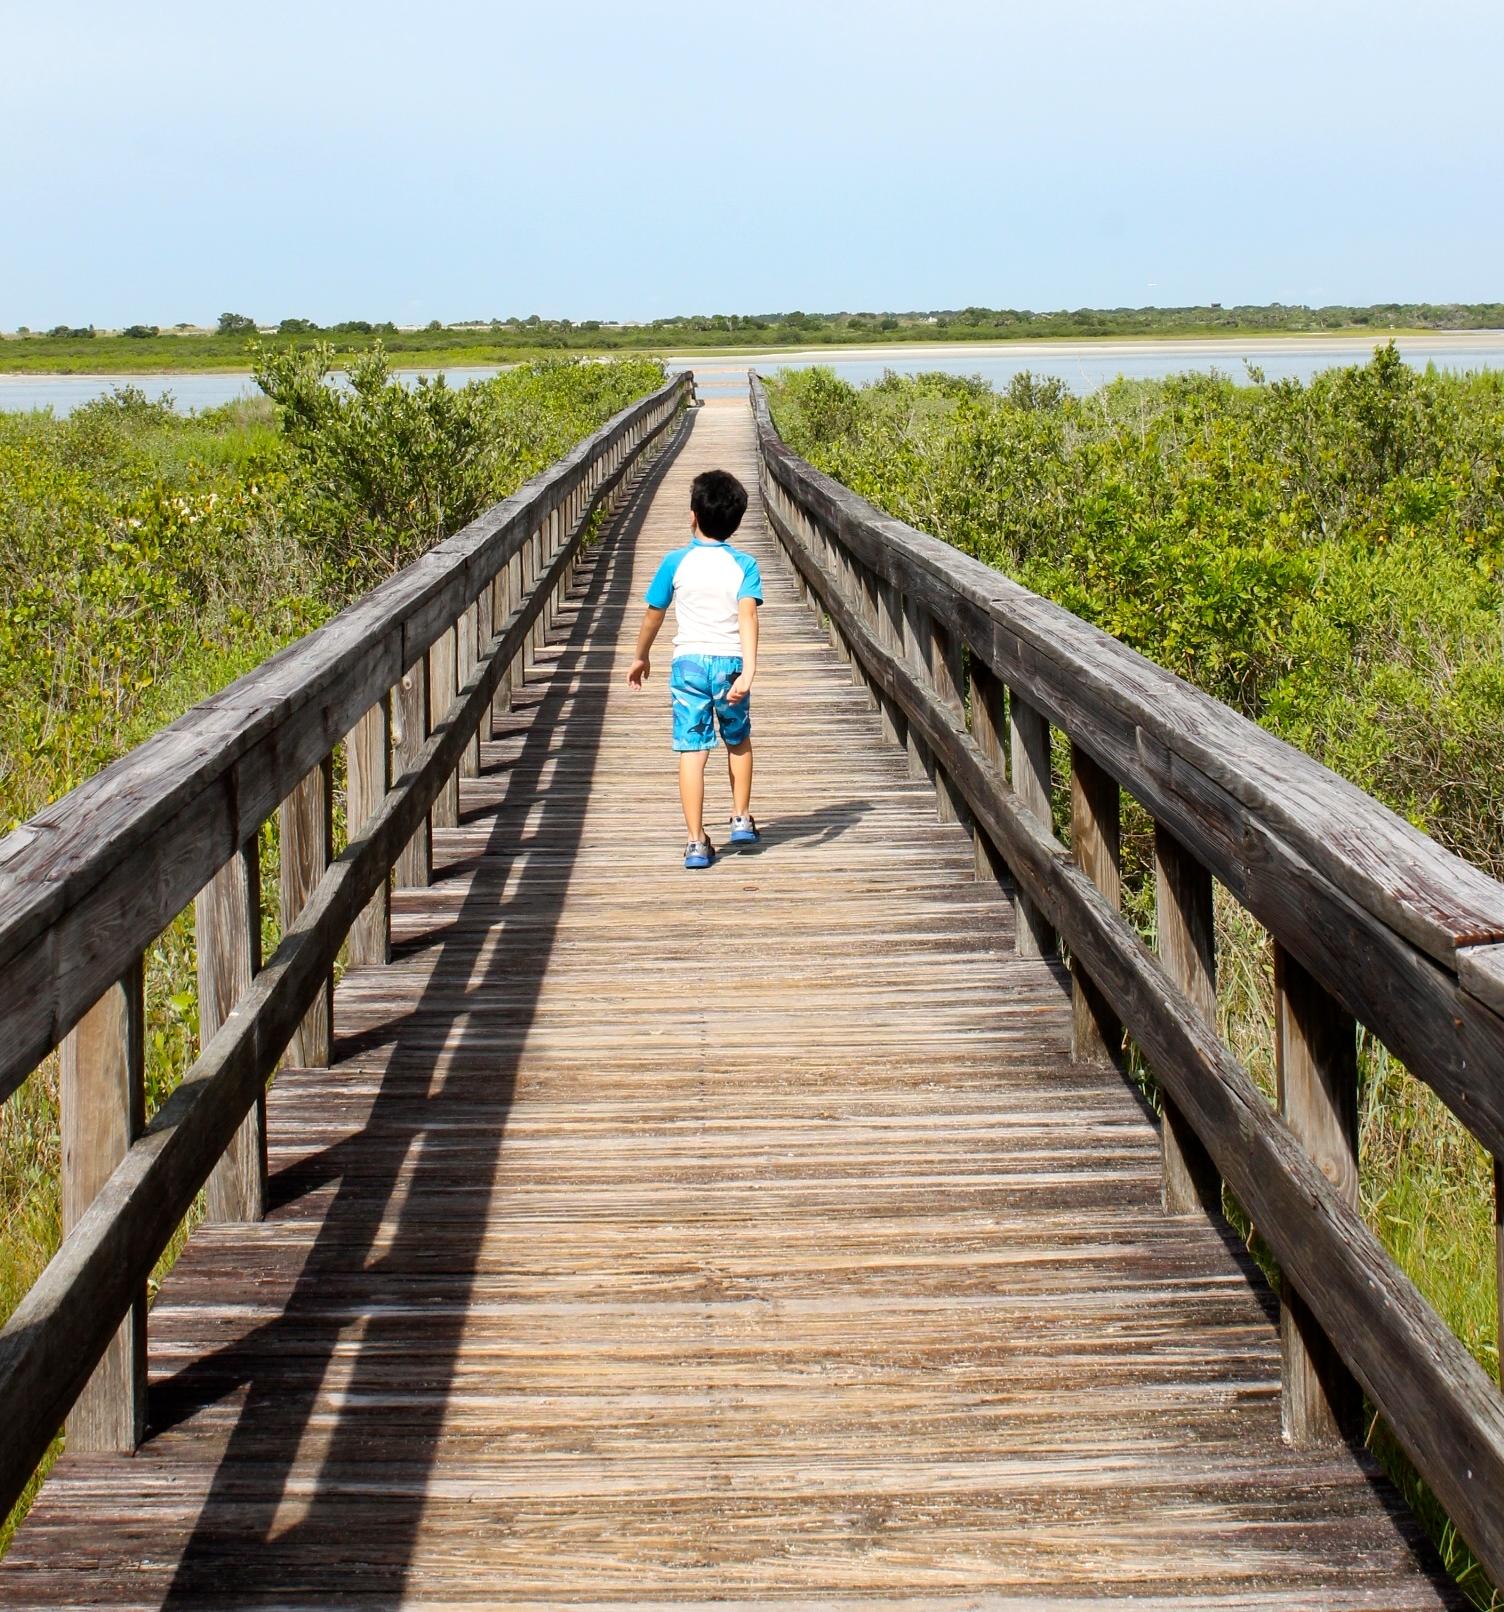 boardwalk at dunes park in New Smyrna beach